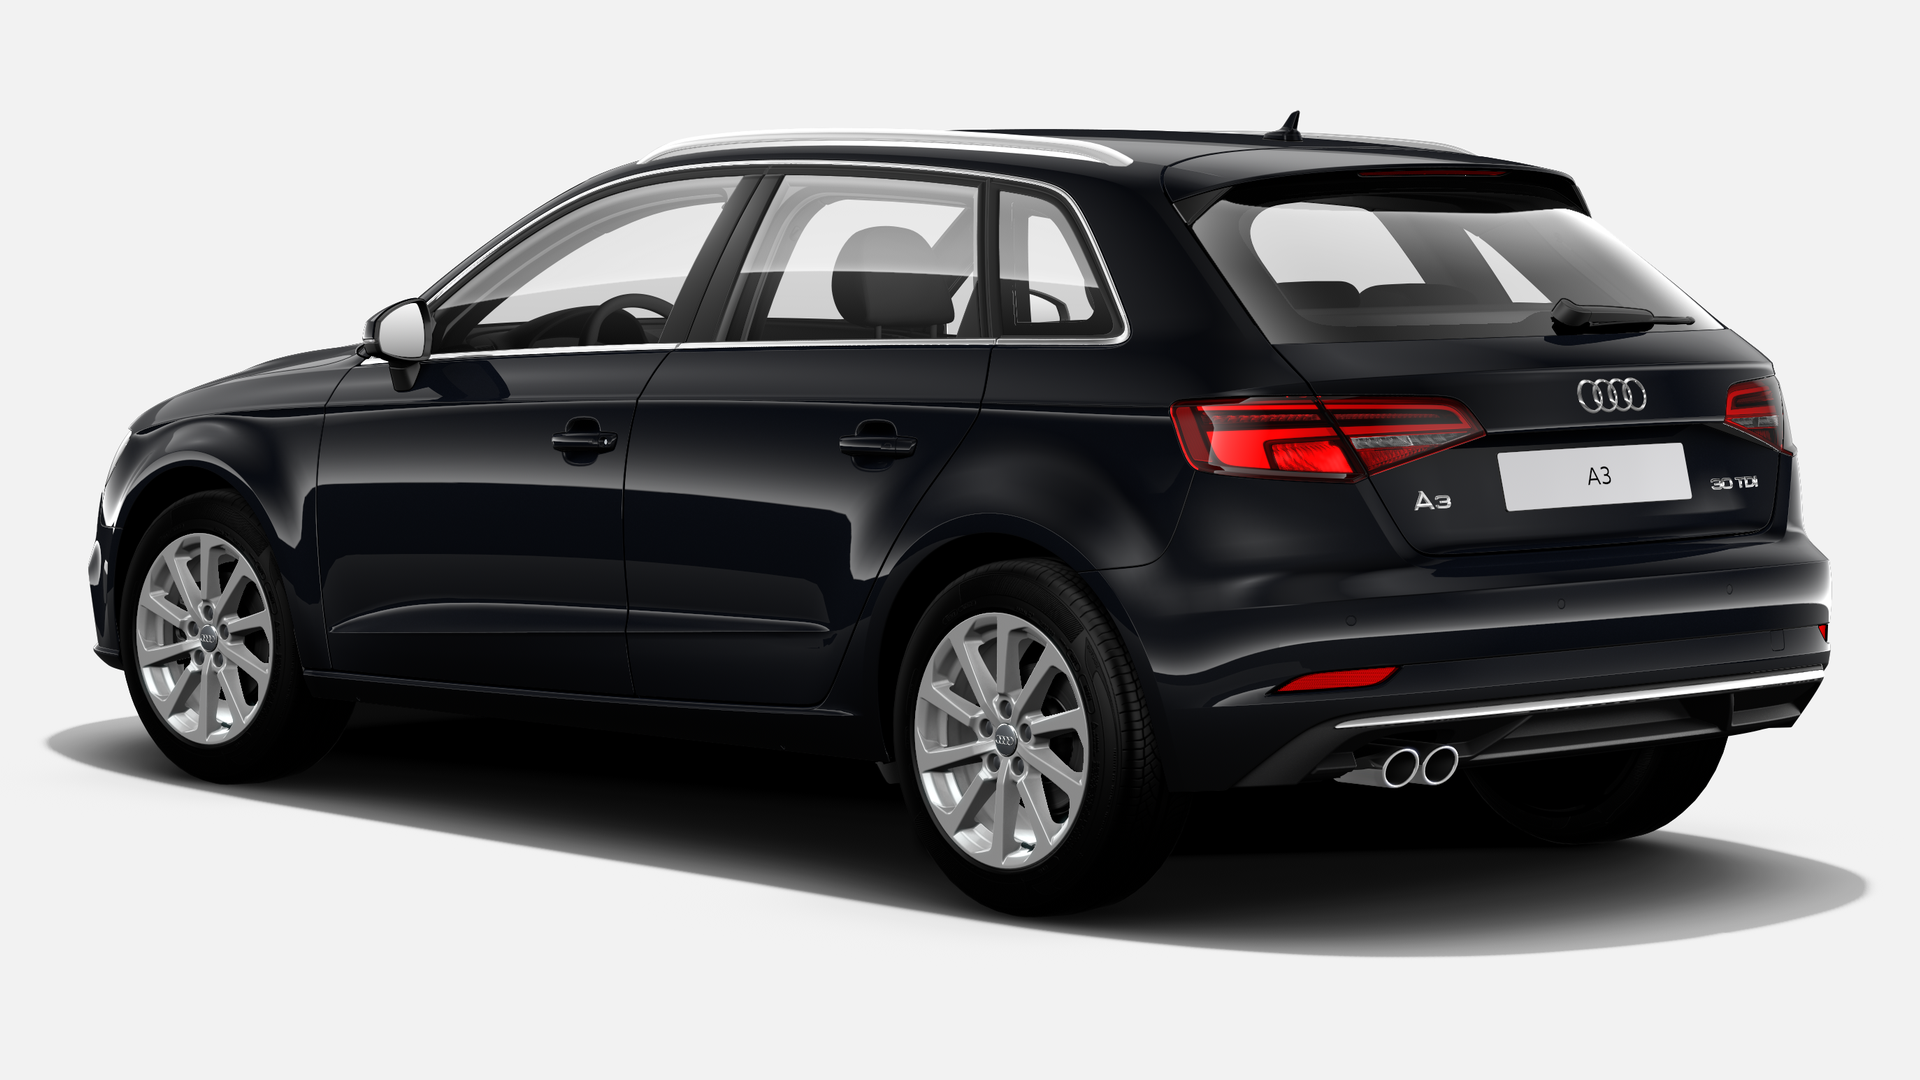 Vista Tres cuartos trasera izquierda de Audi A3 Sportback 30 TDI Design S-tronic  85 kW (116 CV)